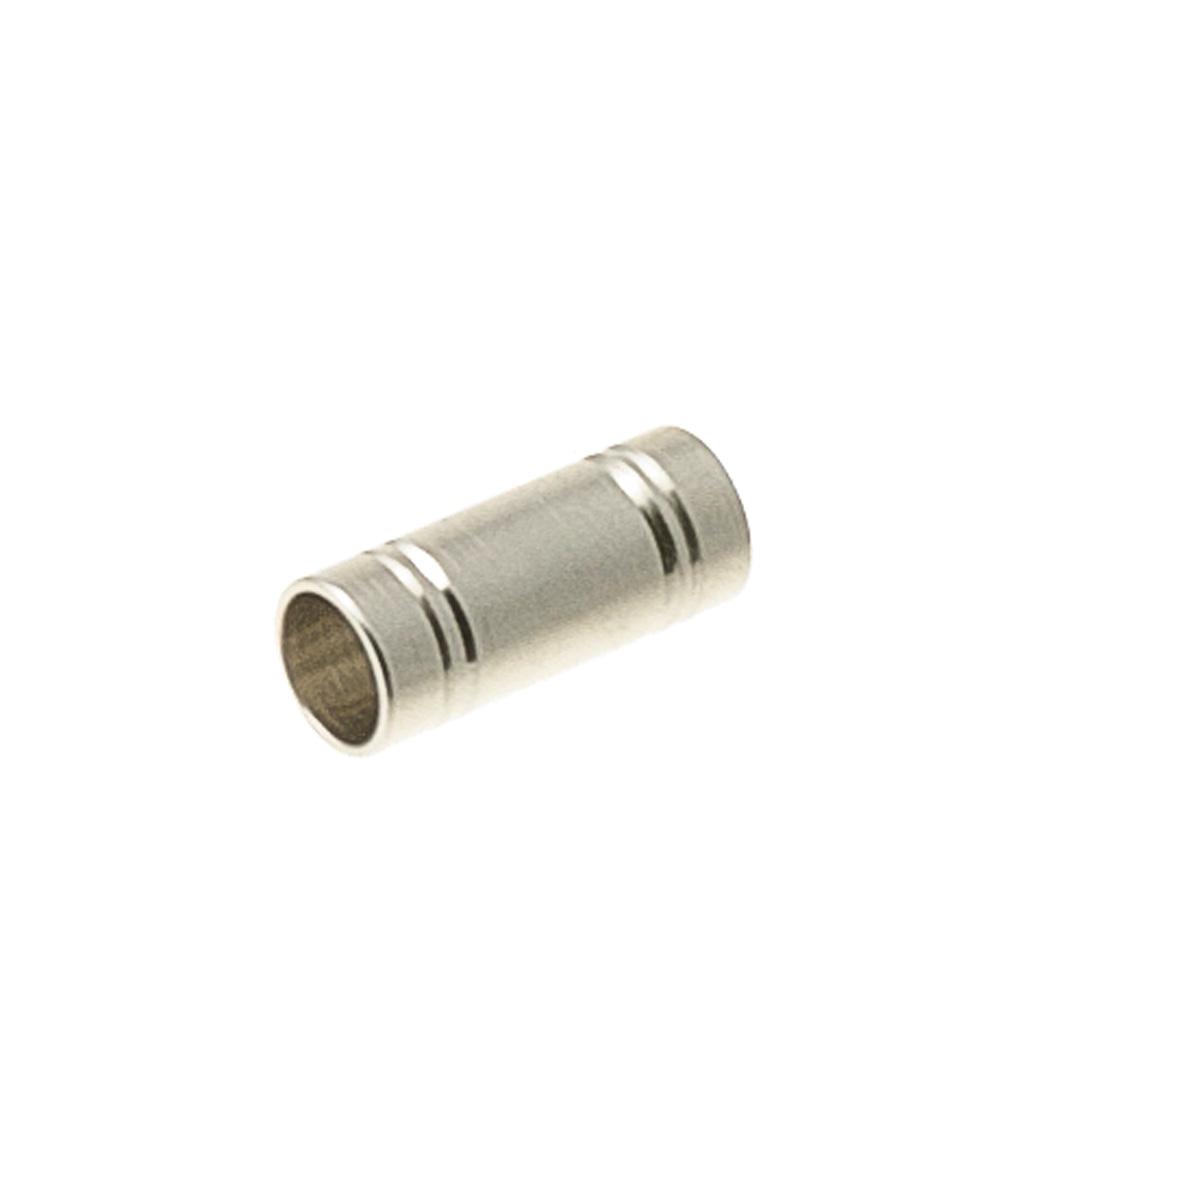 ZooOne Трубка, 4x14 мм (серебристый)